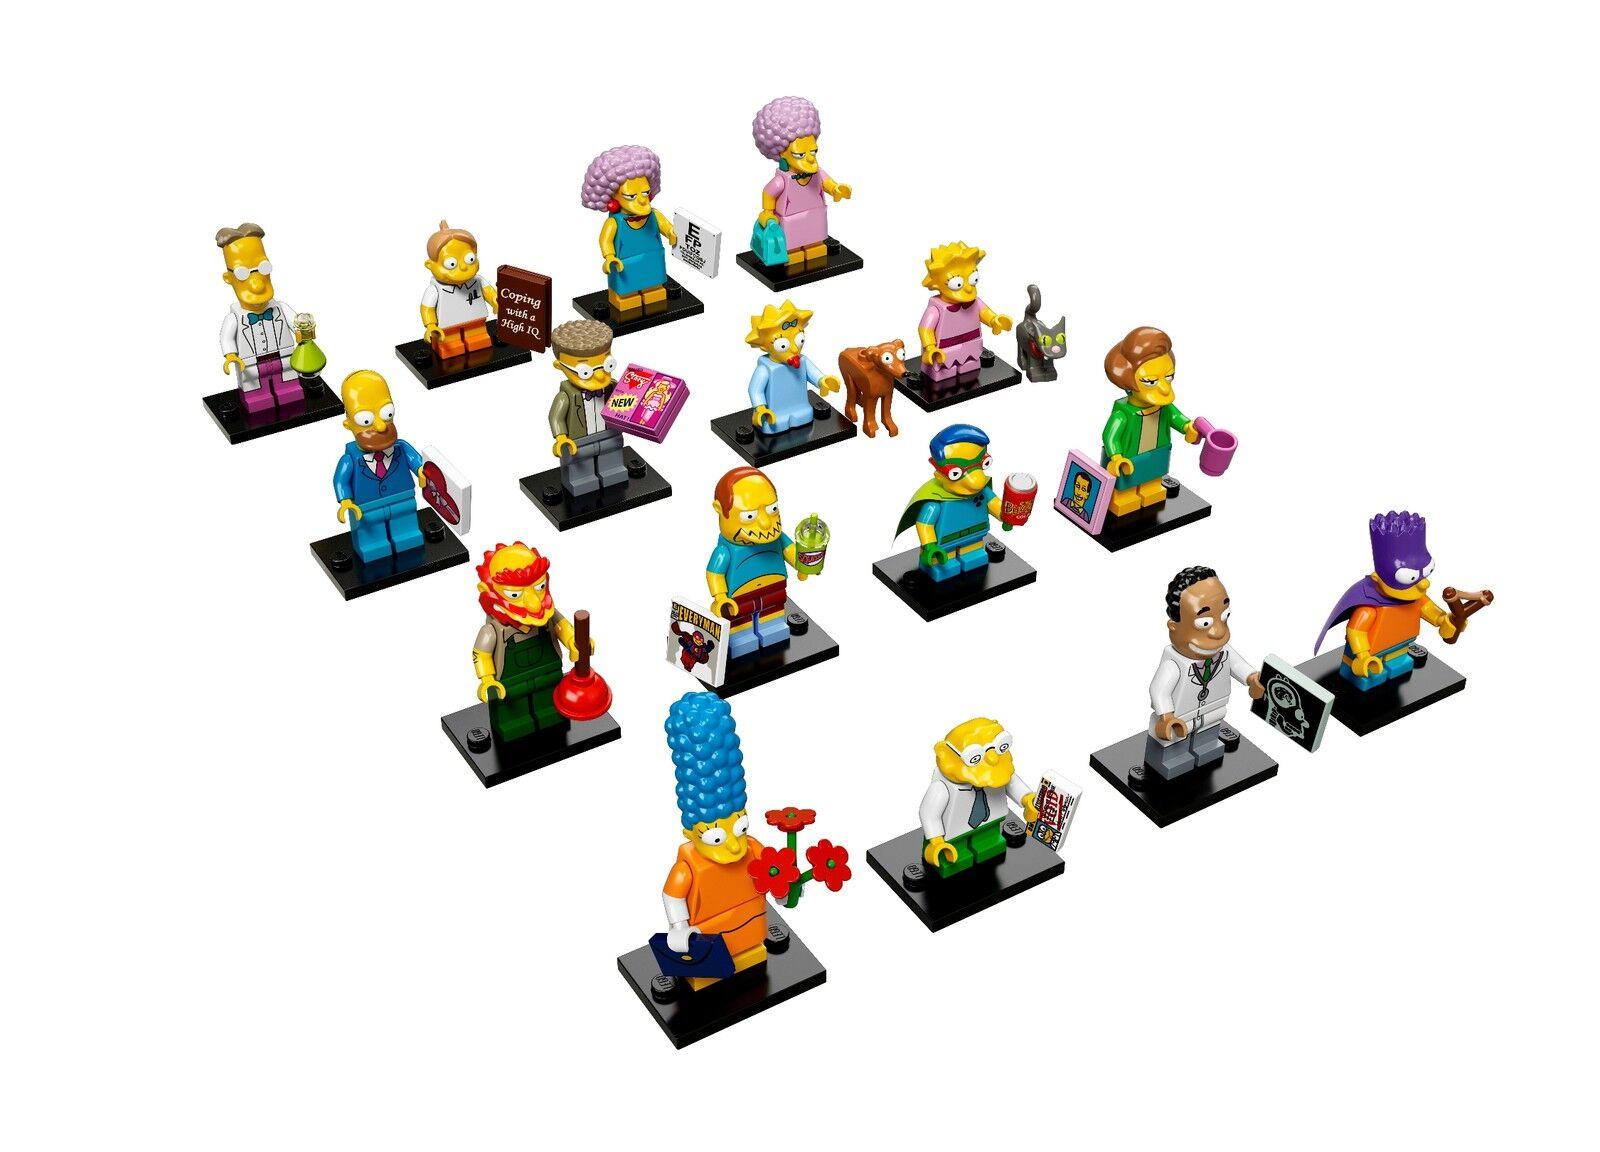 LEGO 71009 SIMPSONS 2 MINIFIGURE MINIFIGURE MINIFIGURE Serie completa Lego 71009 Simpsons Minifigures c25a51